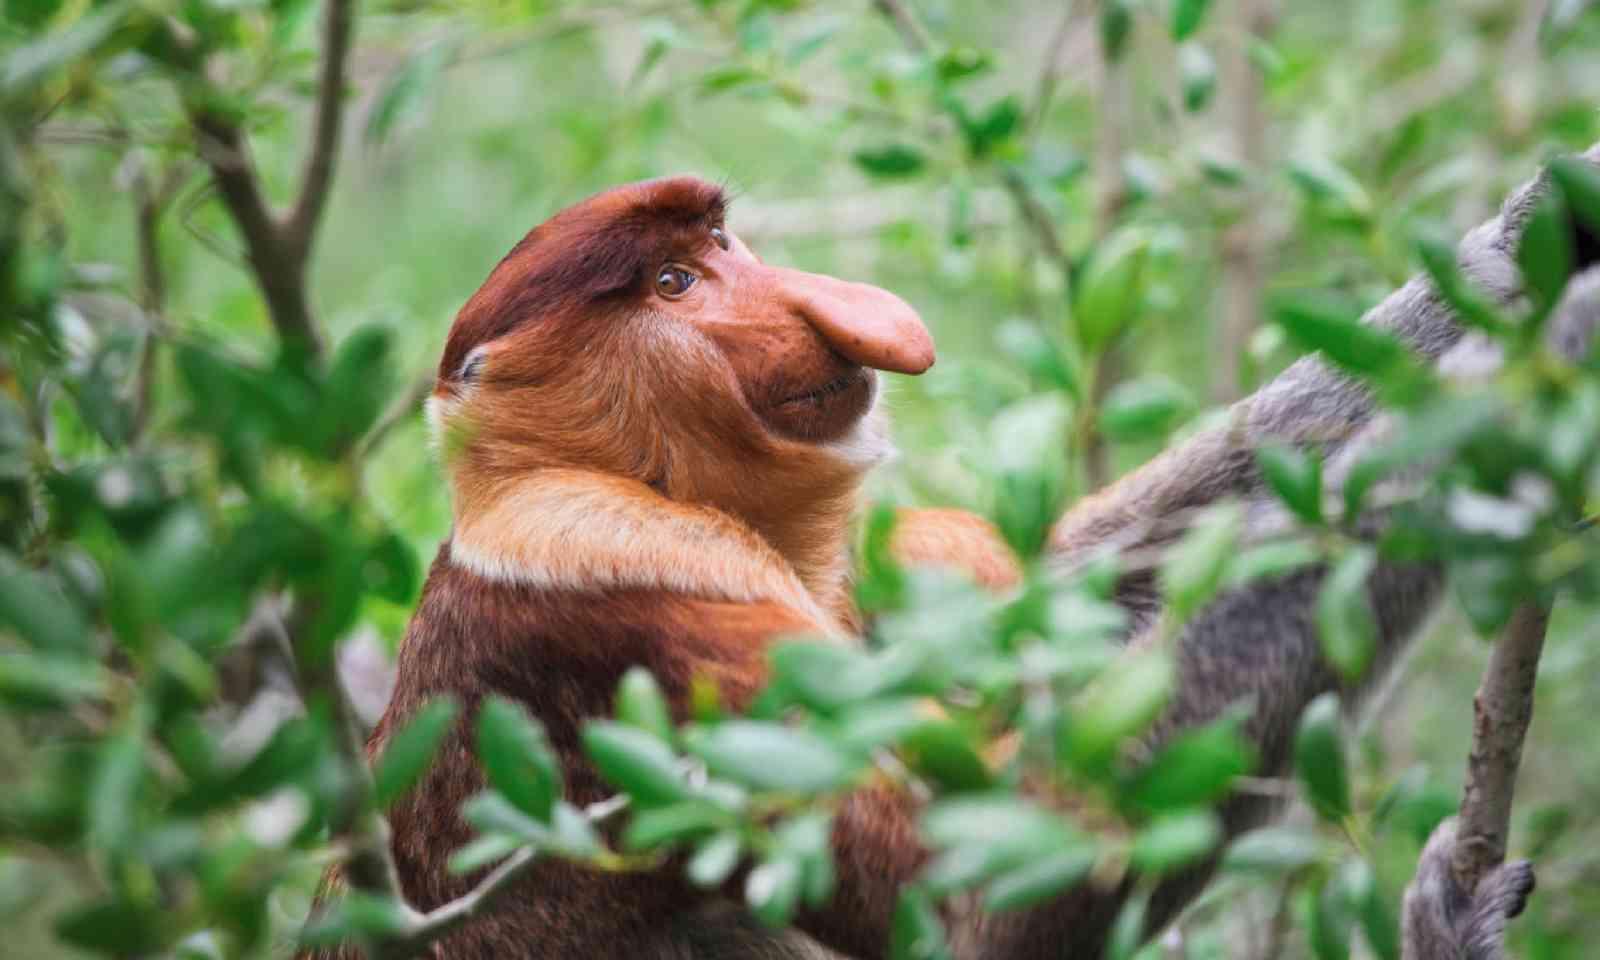 Proboscis monkey (Shutterstock)